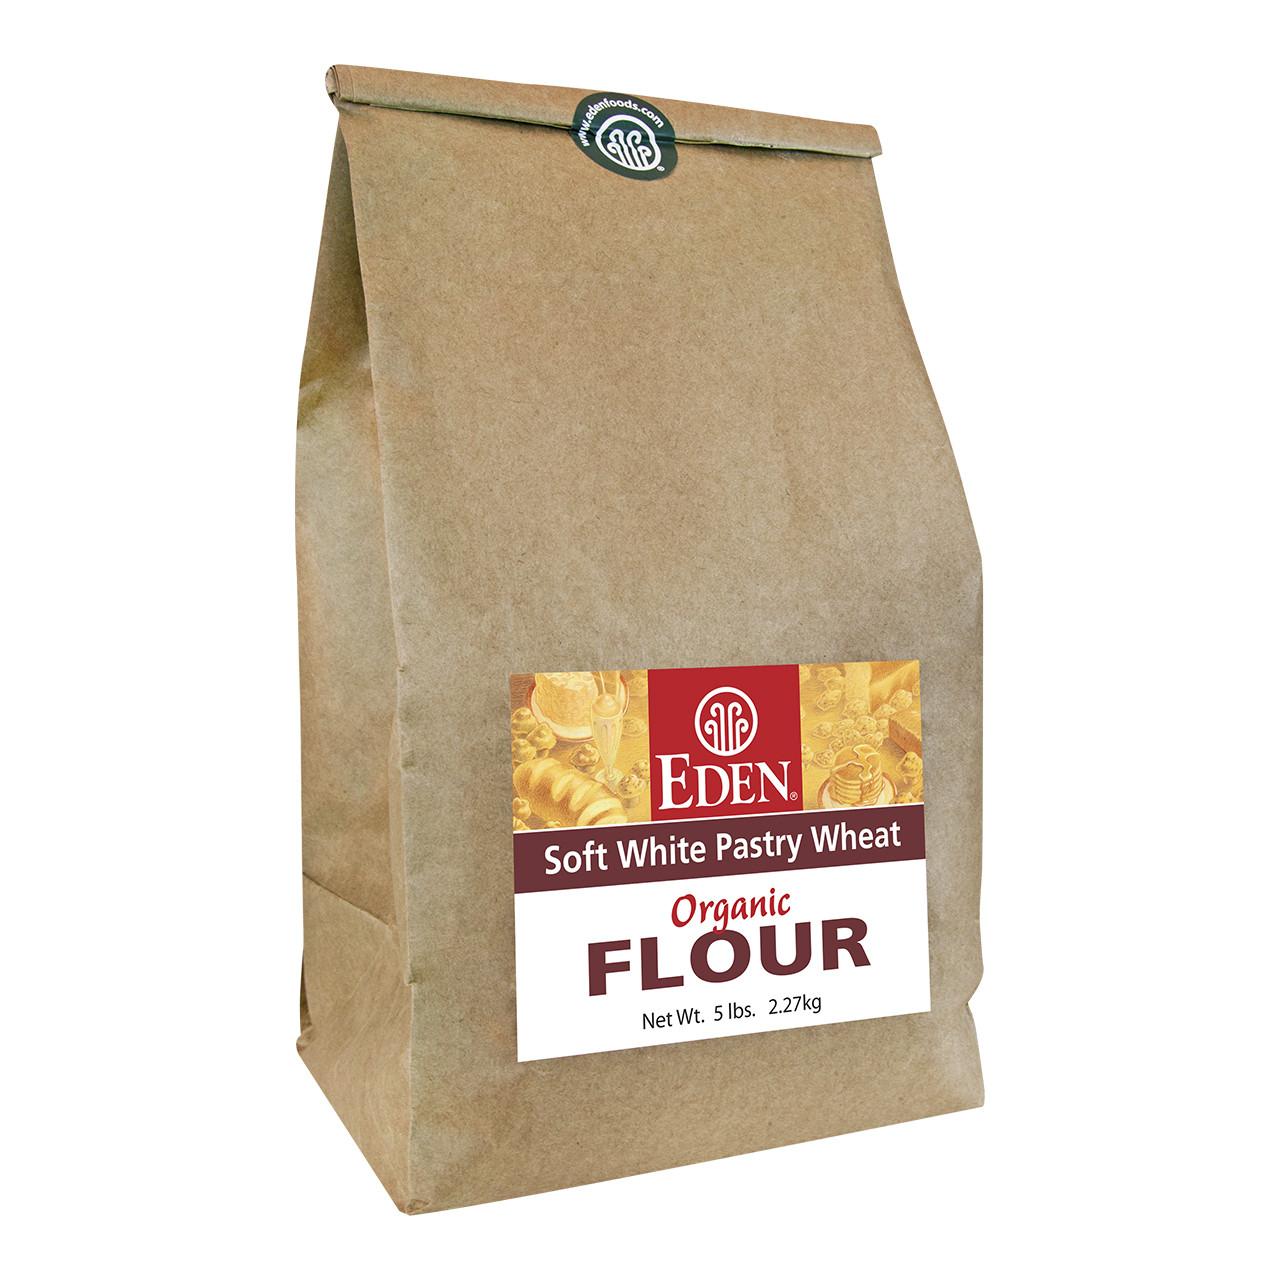 Soft White Pastry Wheat Flour, Organic - 5 lb